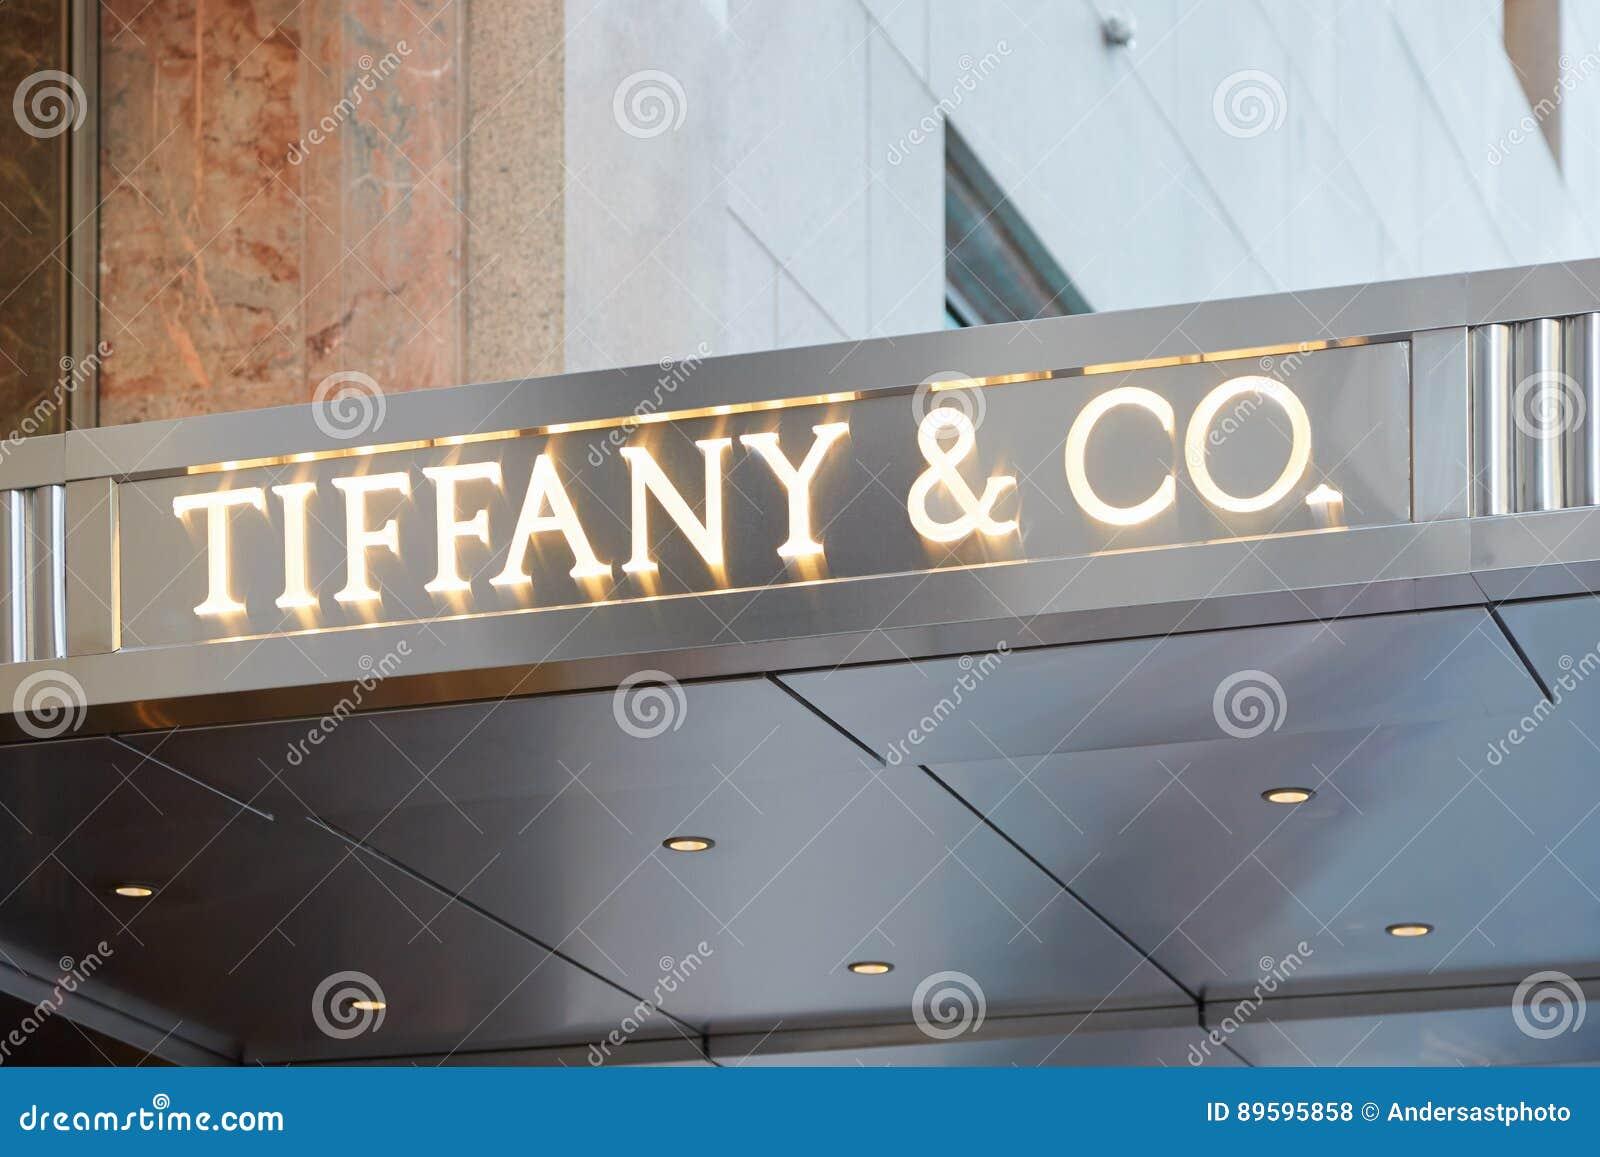 0c8f926b3ad8 NEW YORK - SEPTEMBER 12  Tiffany e Co. shop sign Fifth Ave illuminated on  September 12